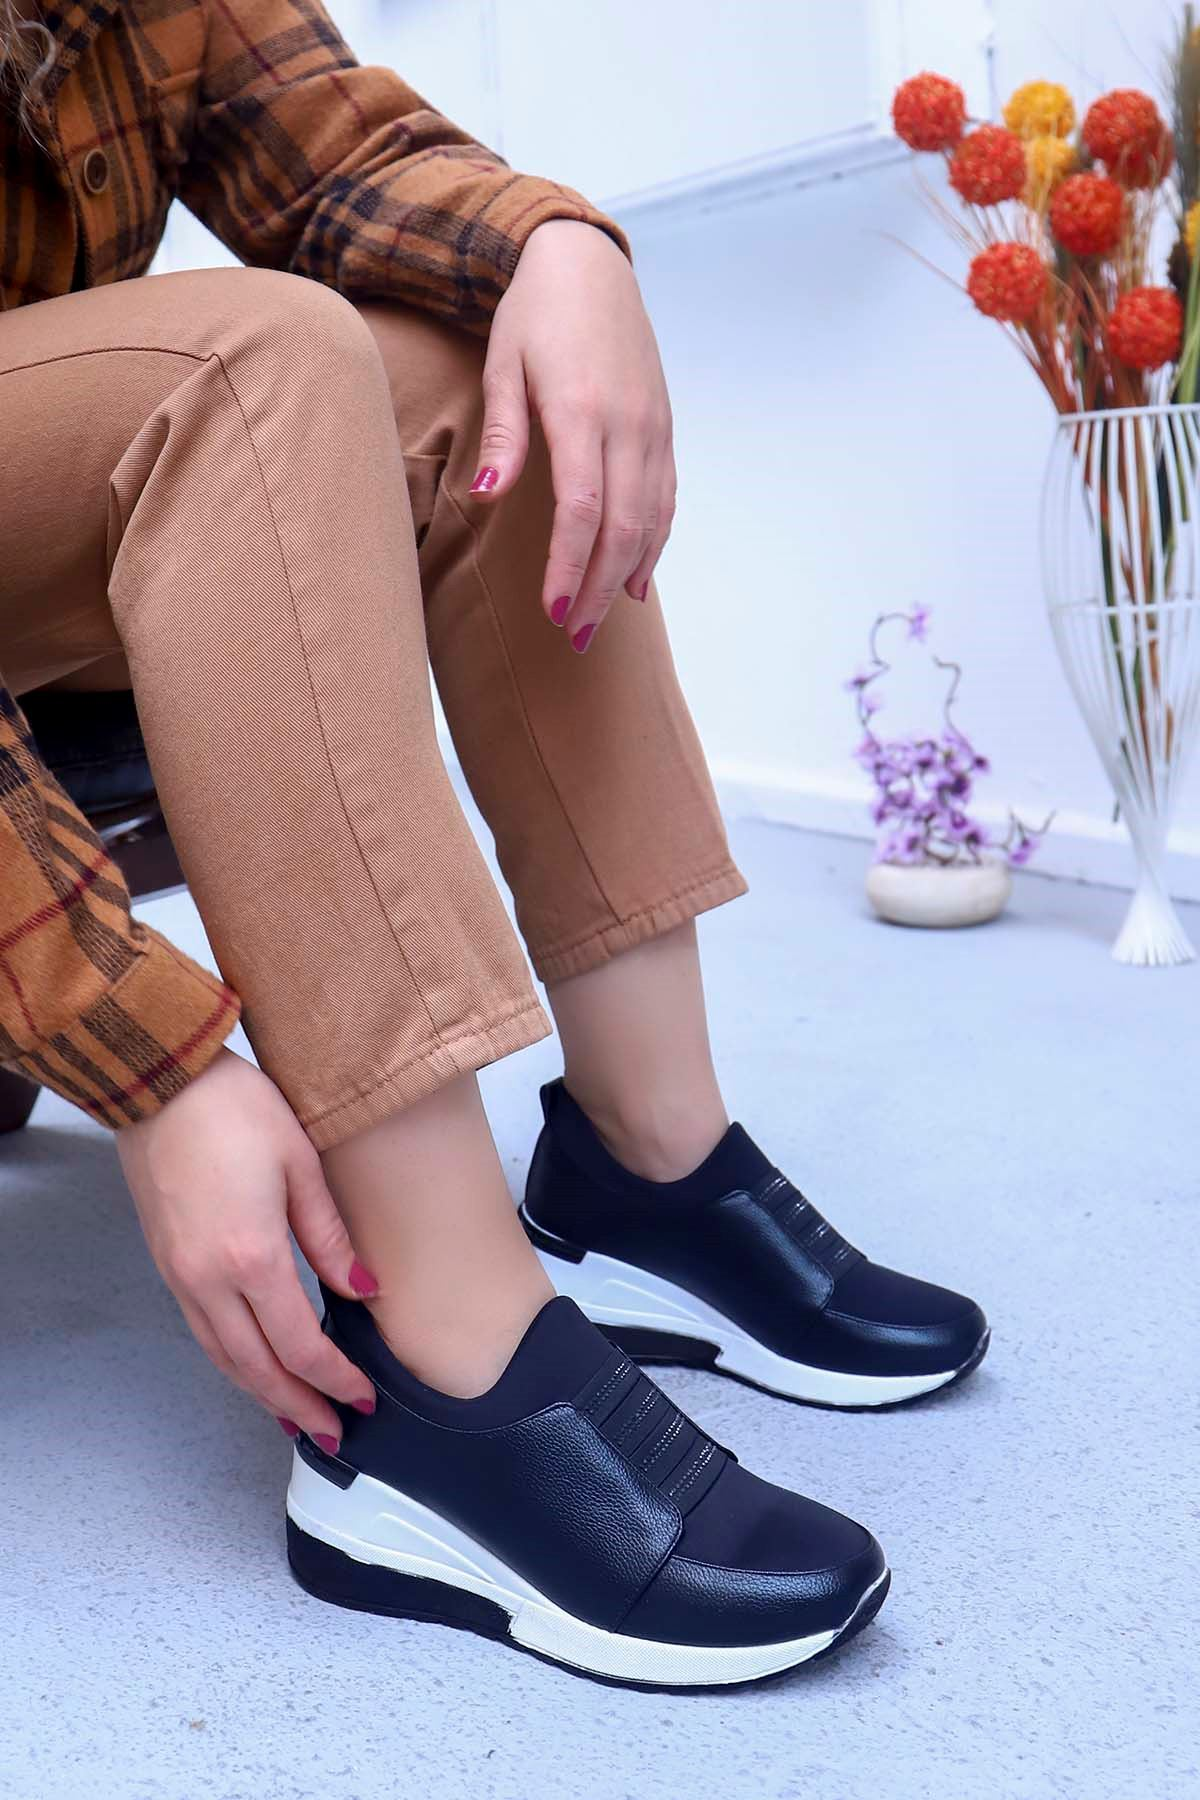 mami-7730 Dolgu Taban Taş Detay Ayakkabı Siyah